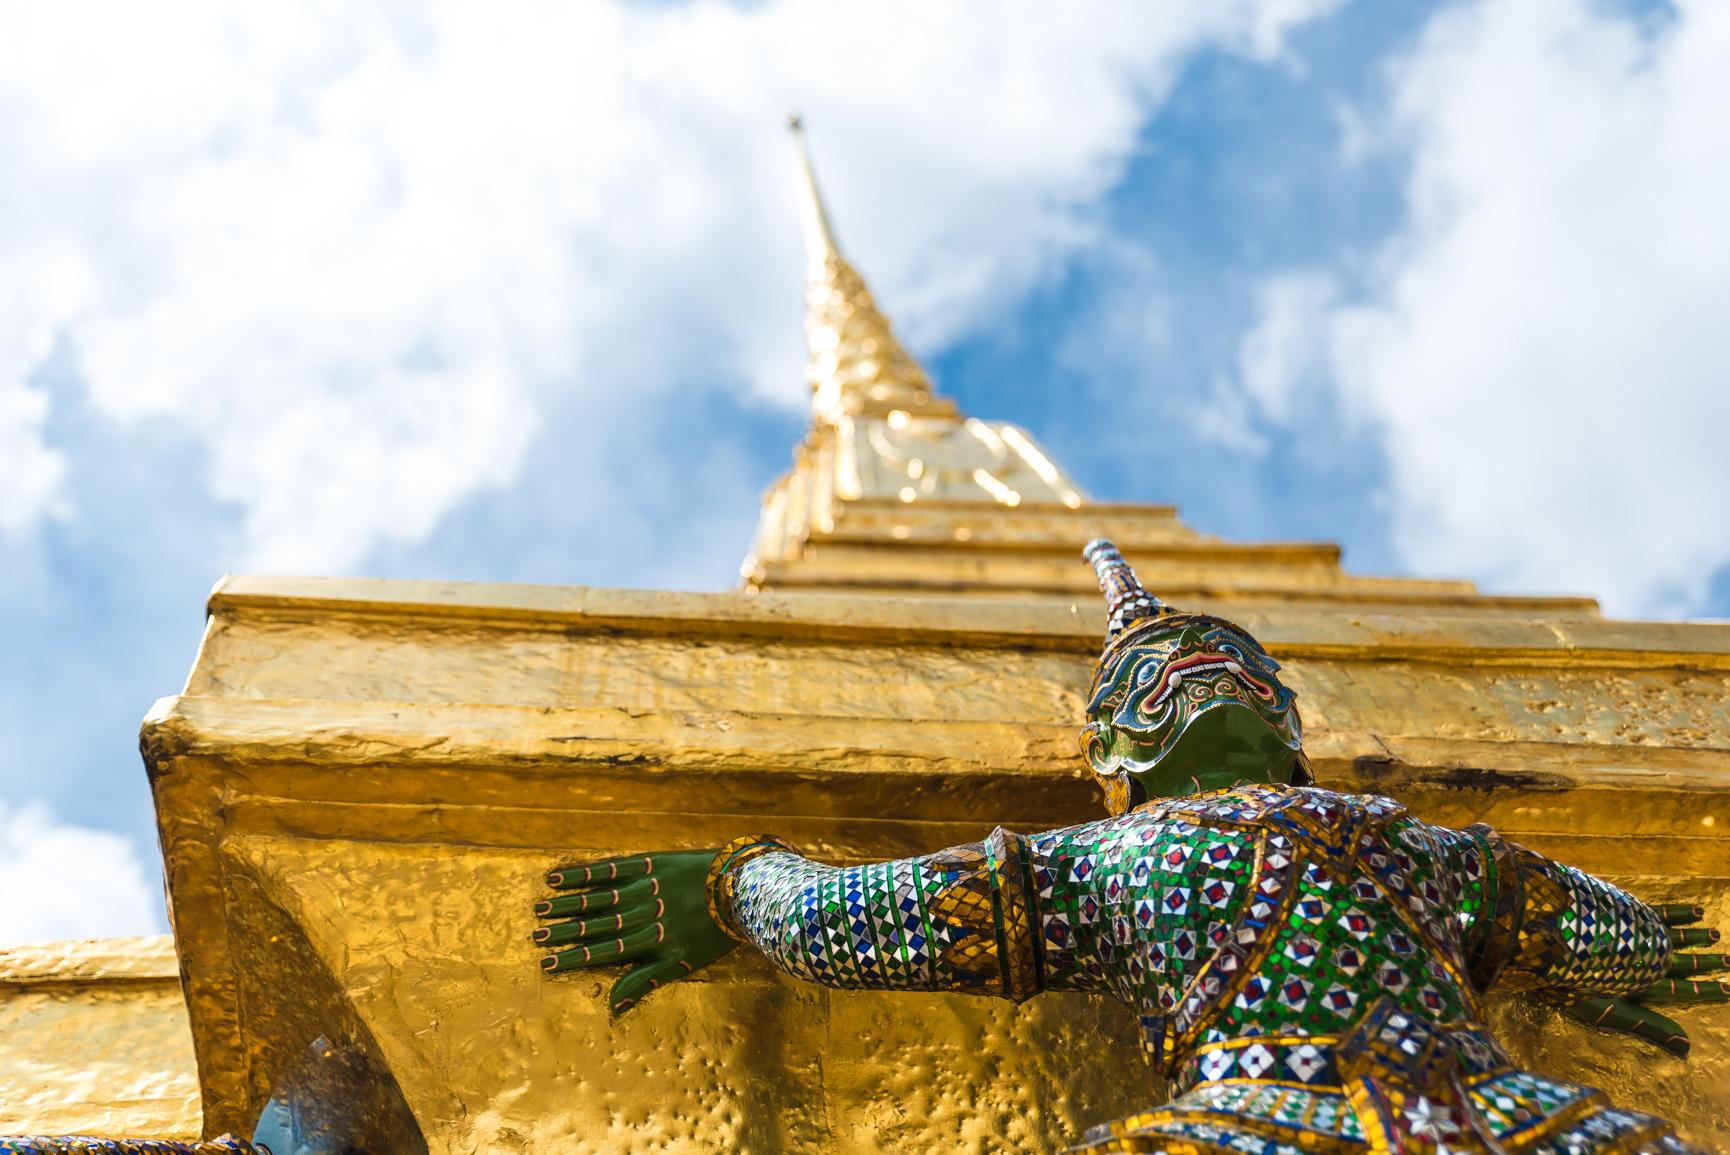 Ibrahim Badru Thailand eyeobee ART The Wandering eye_-10.jpg